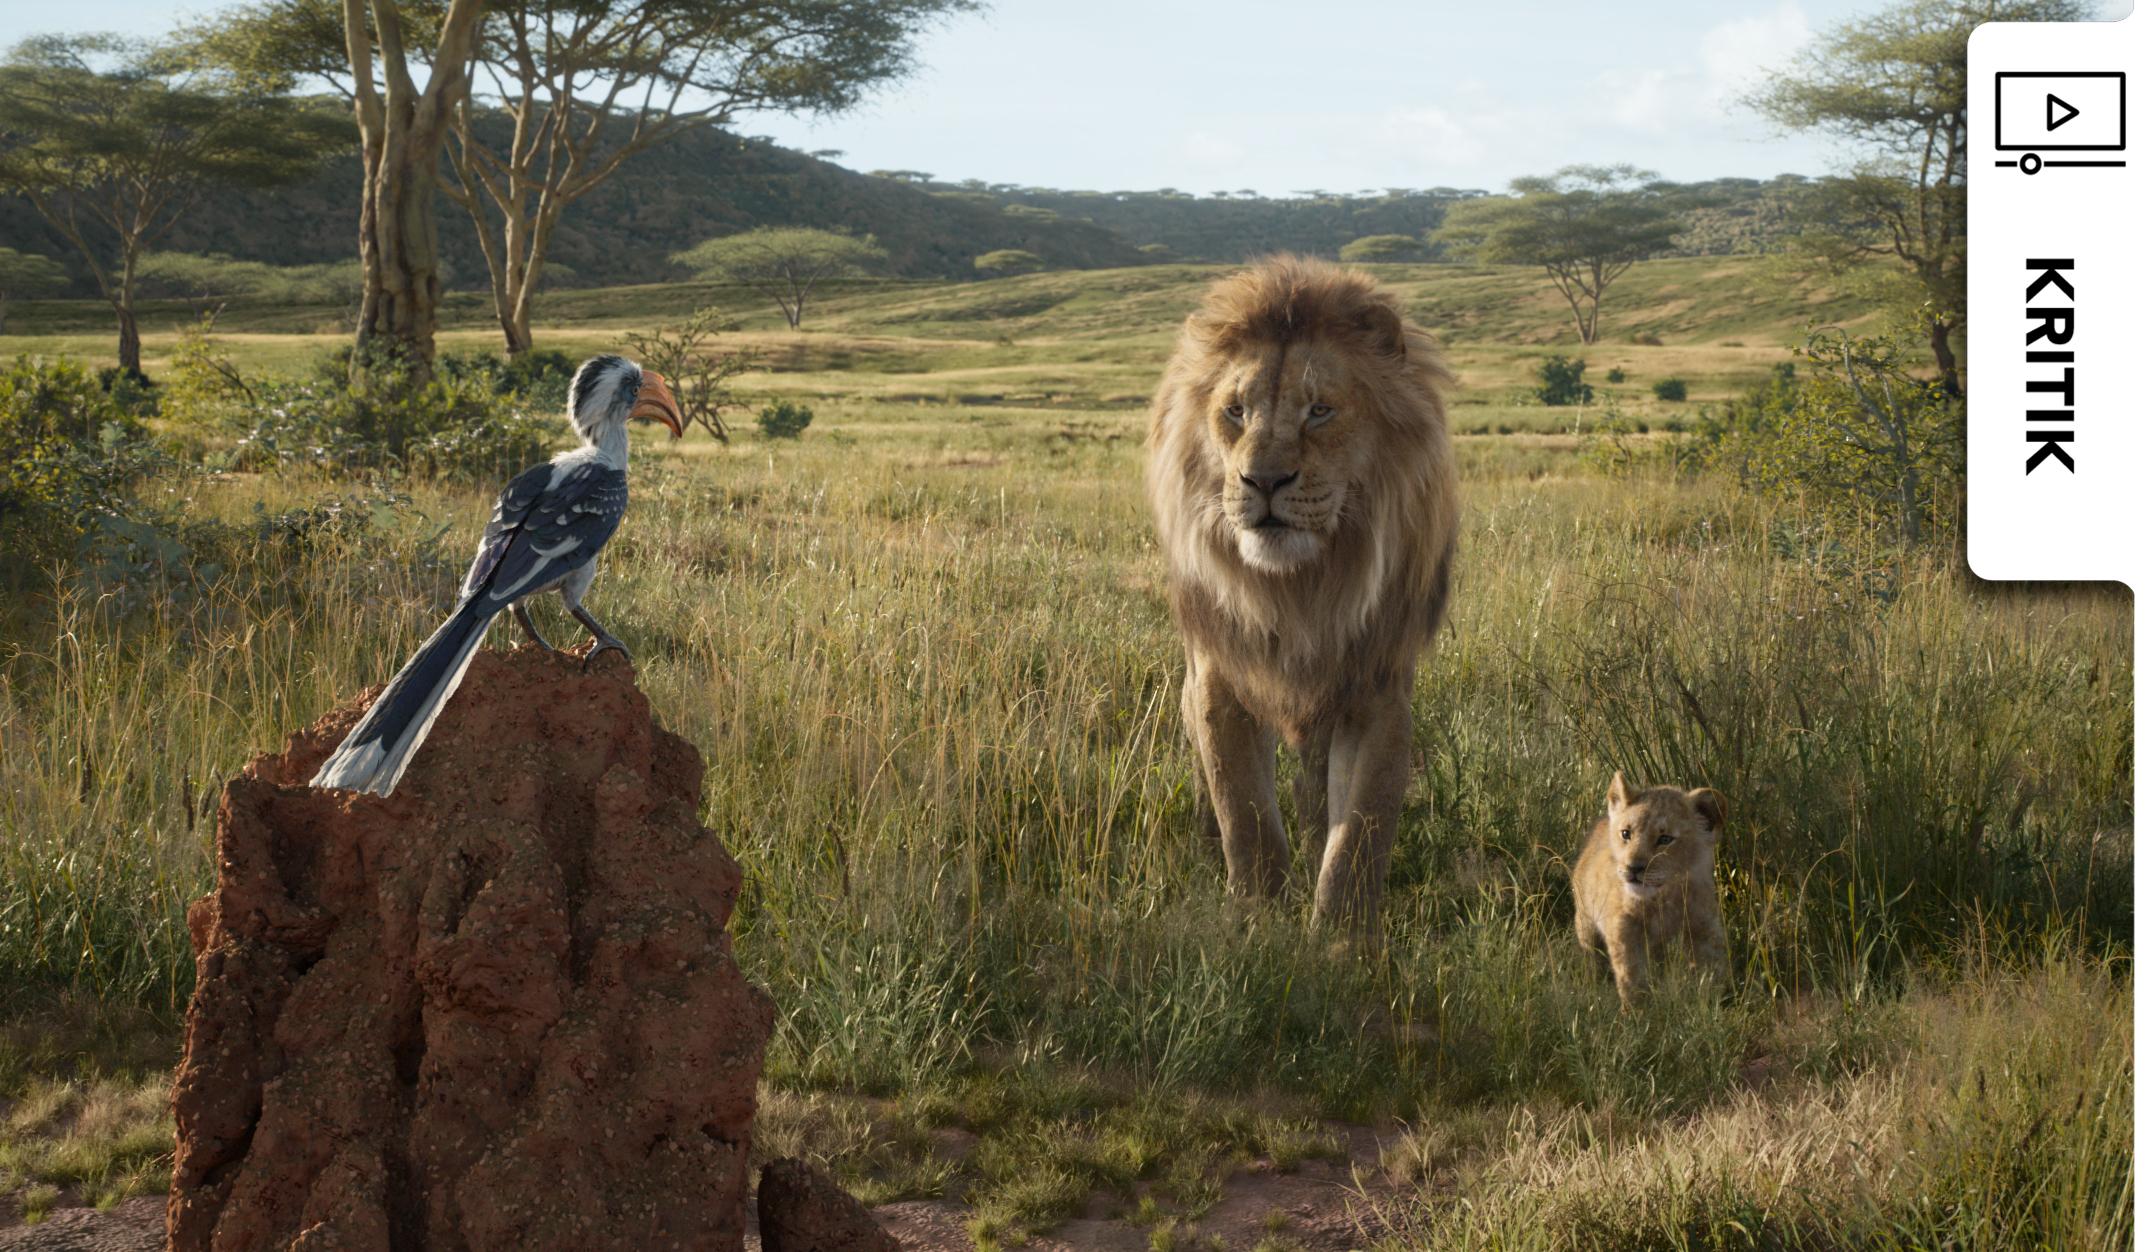 König der Löwen: So ist die Neuverfilmung des Disney-Klassikers